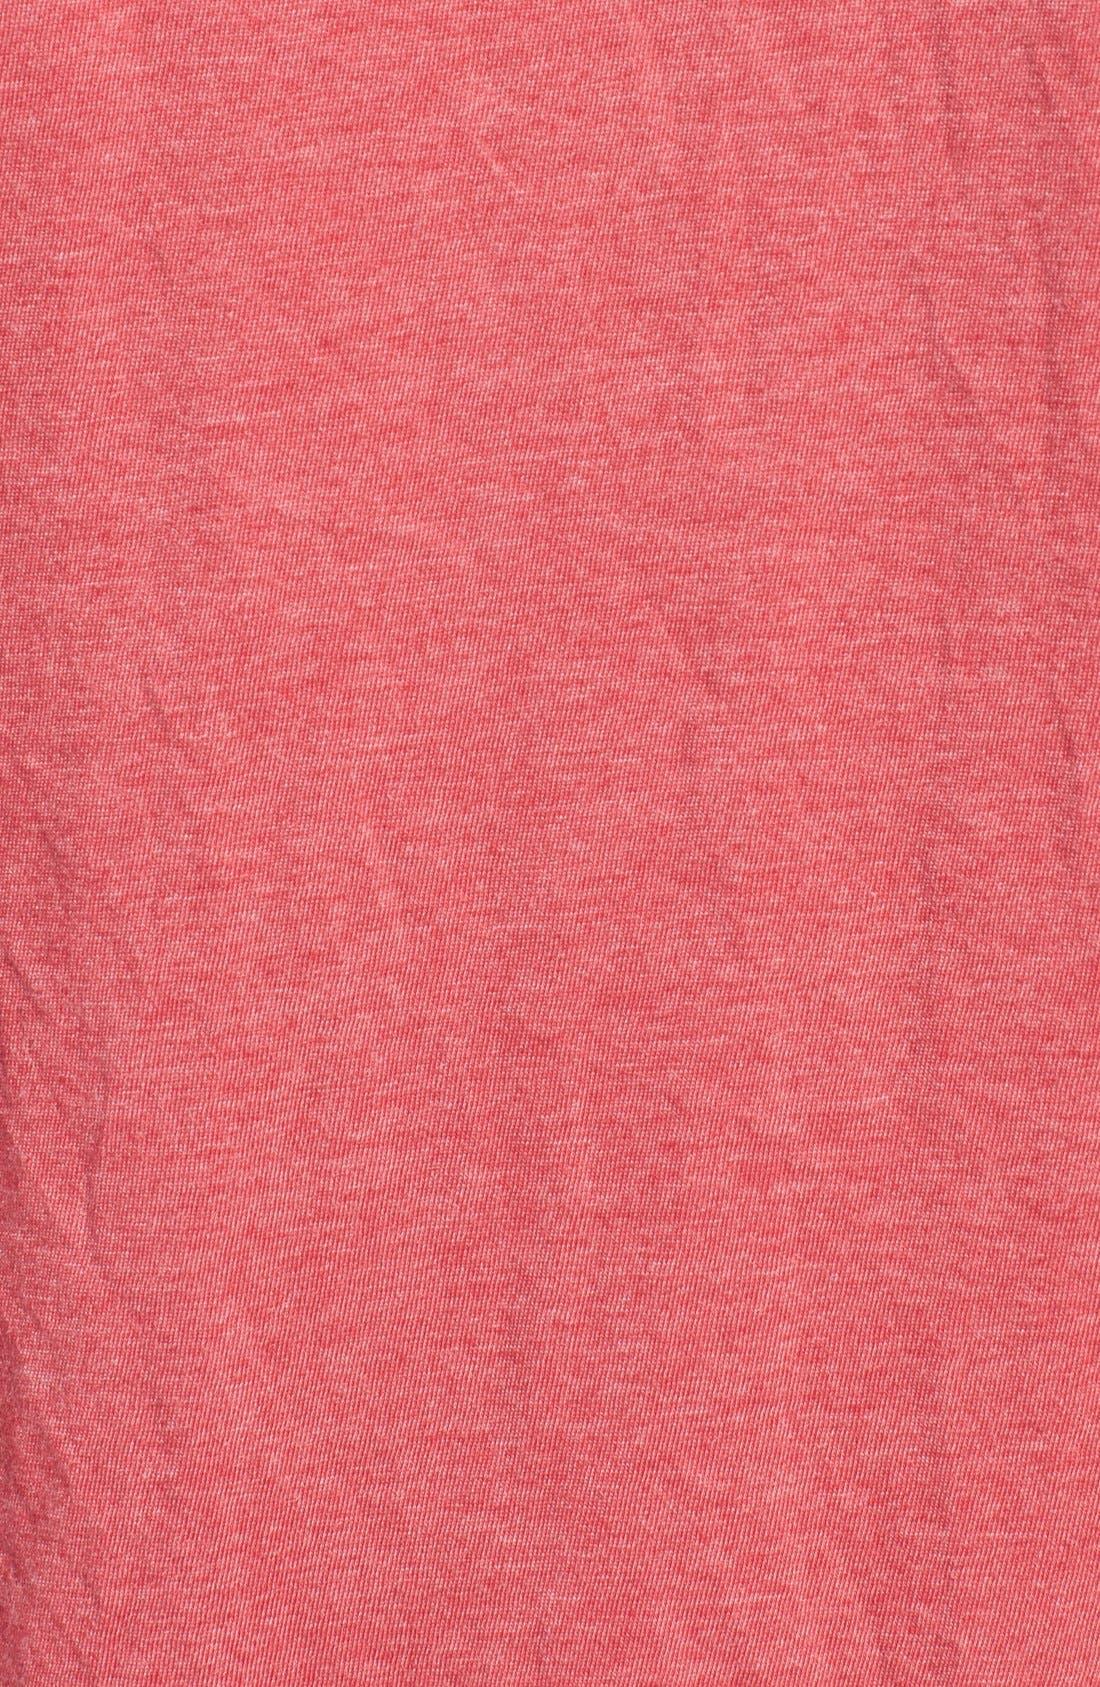 'California Angels' Graphic V-Neck T-Shirt,                             Alternate thumbnail 5, color,                             600